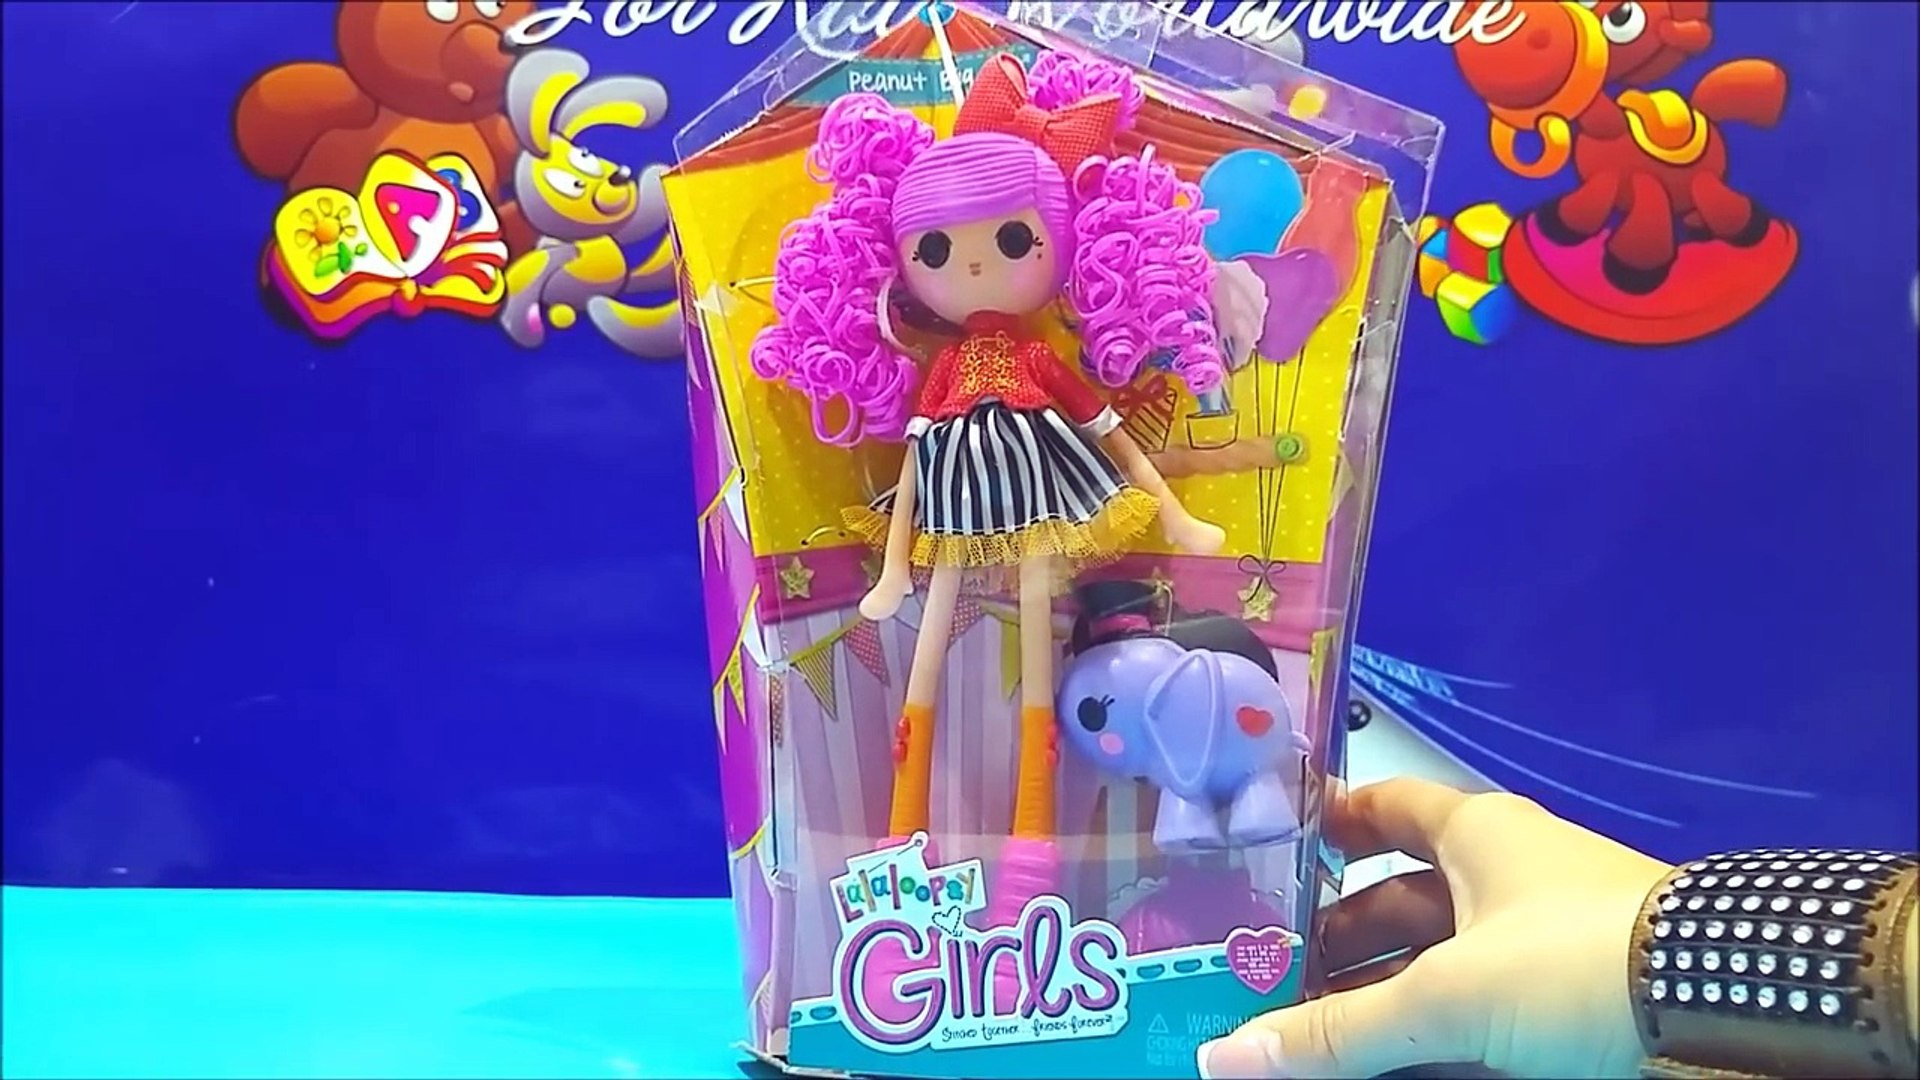 Lalaloopsy Girls Peanut Big Top Doll Toy Videos ★ Cute Lalaloopsy Girl Doll For Girls Worldwide